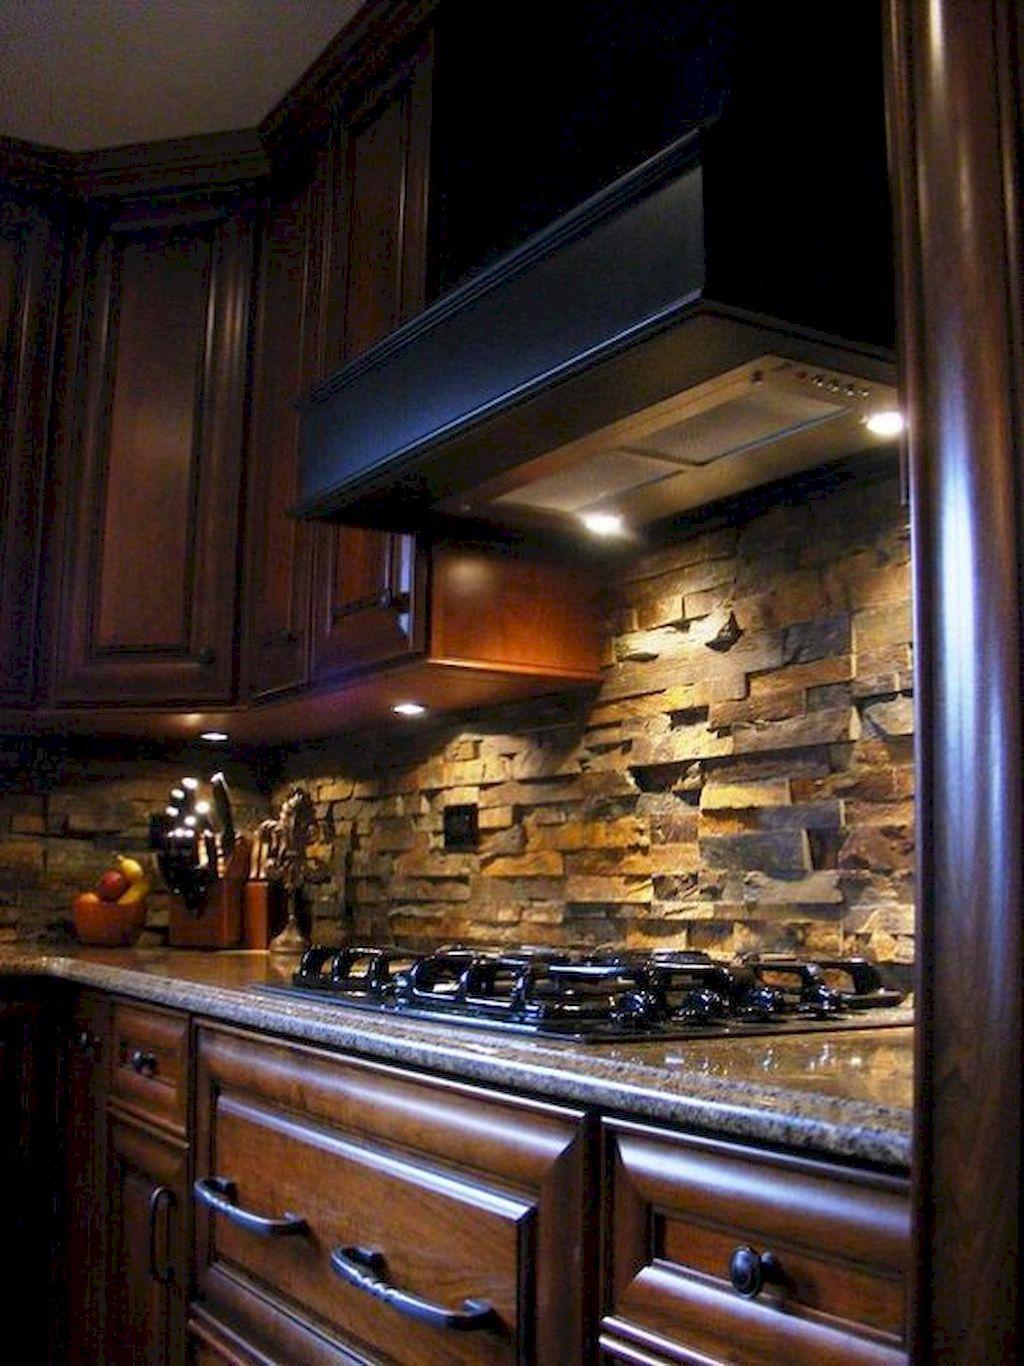 Awesome kitchen backsplash with dark cabinets besideroom